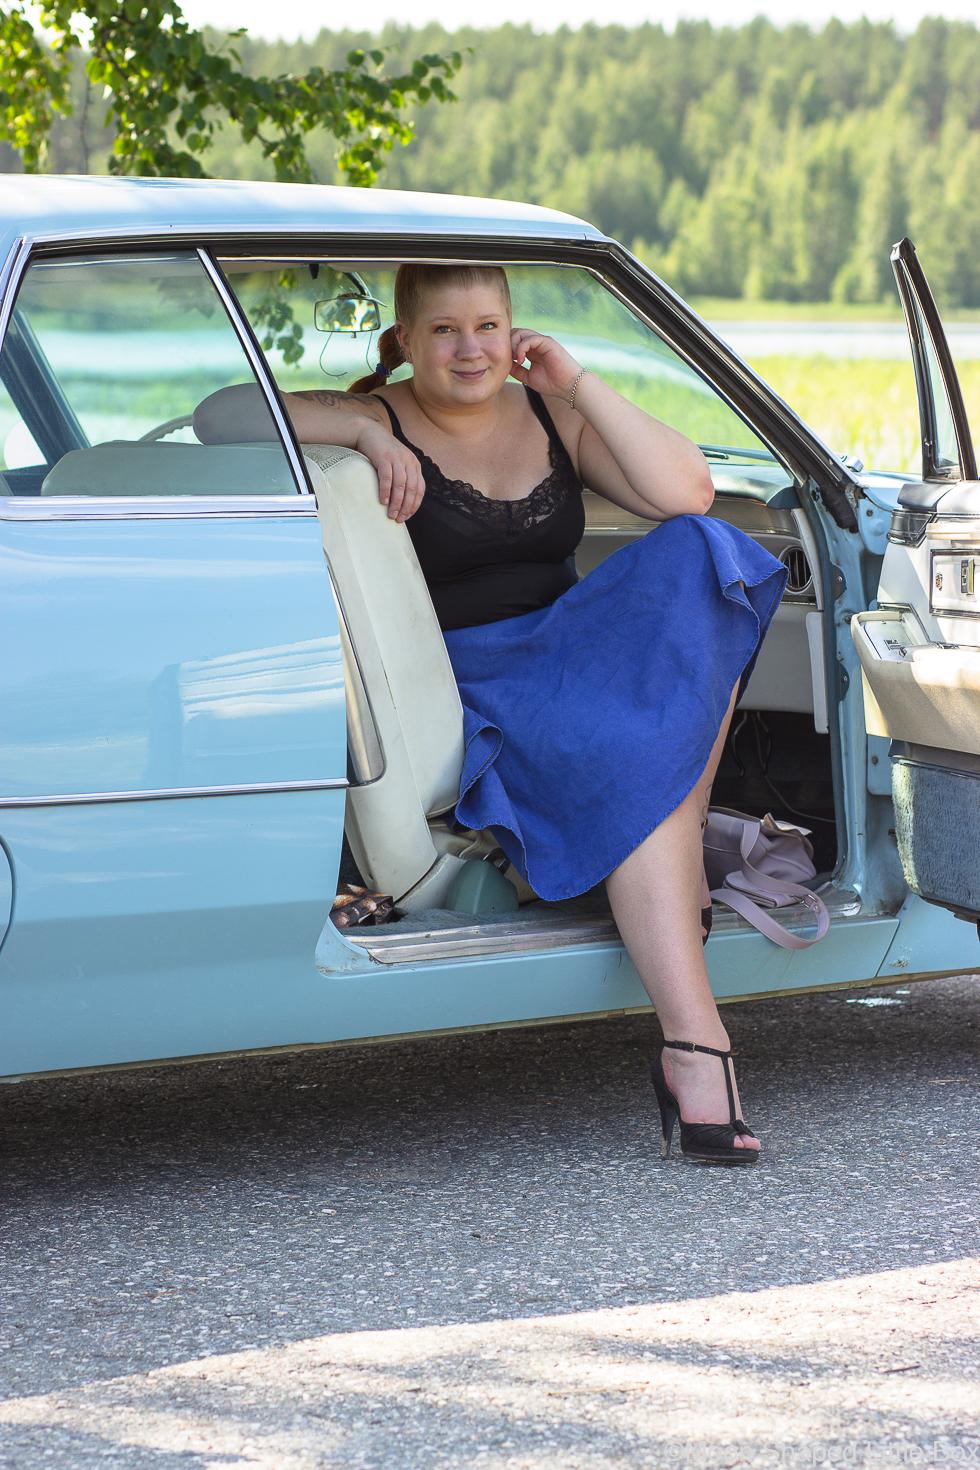 Ajelemassa-Cadillacilla